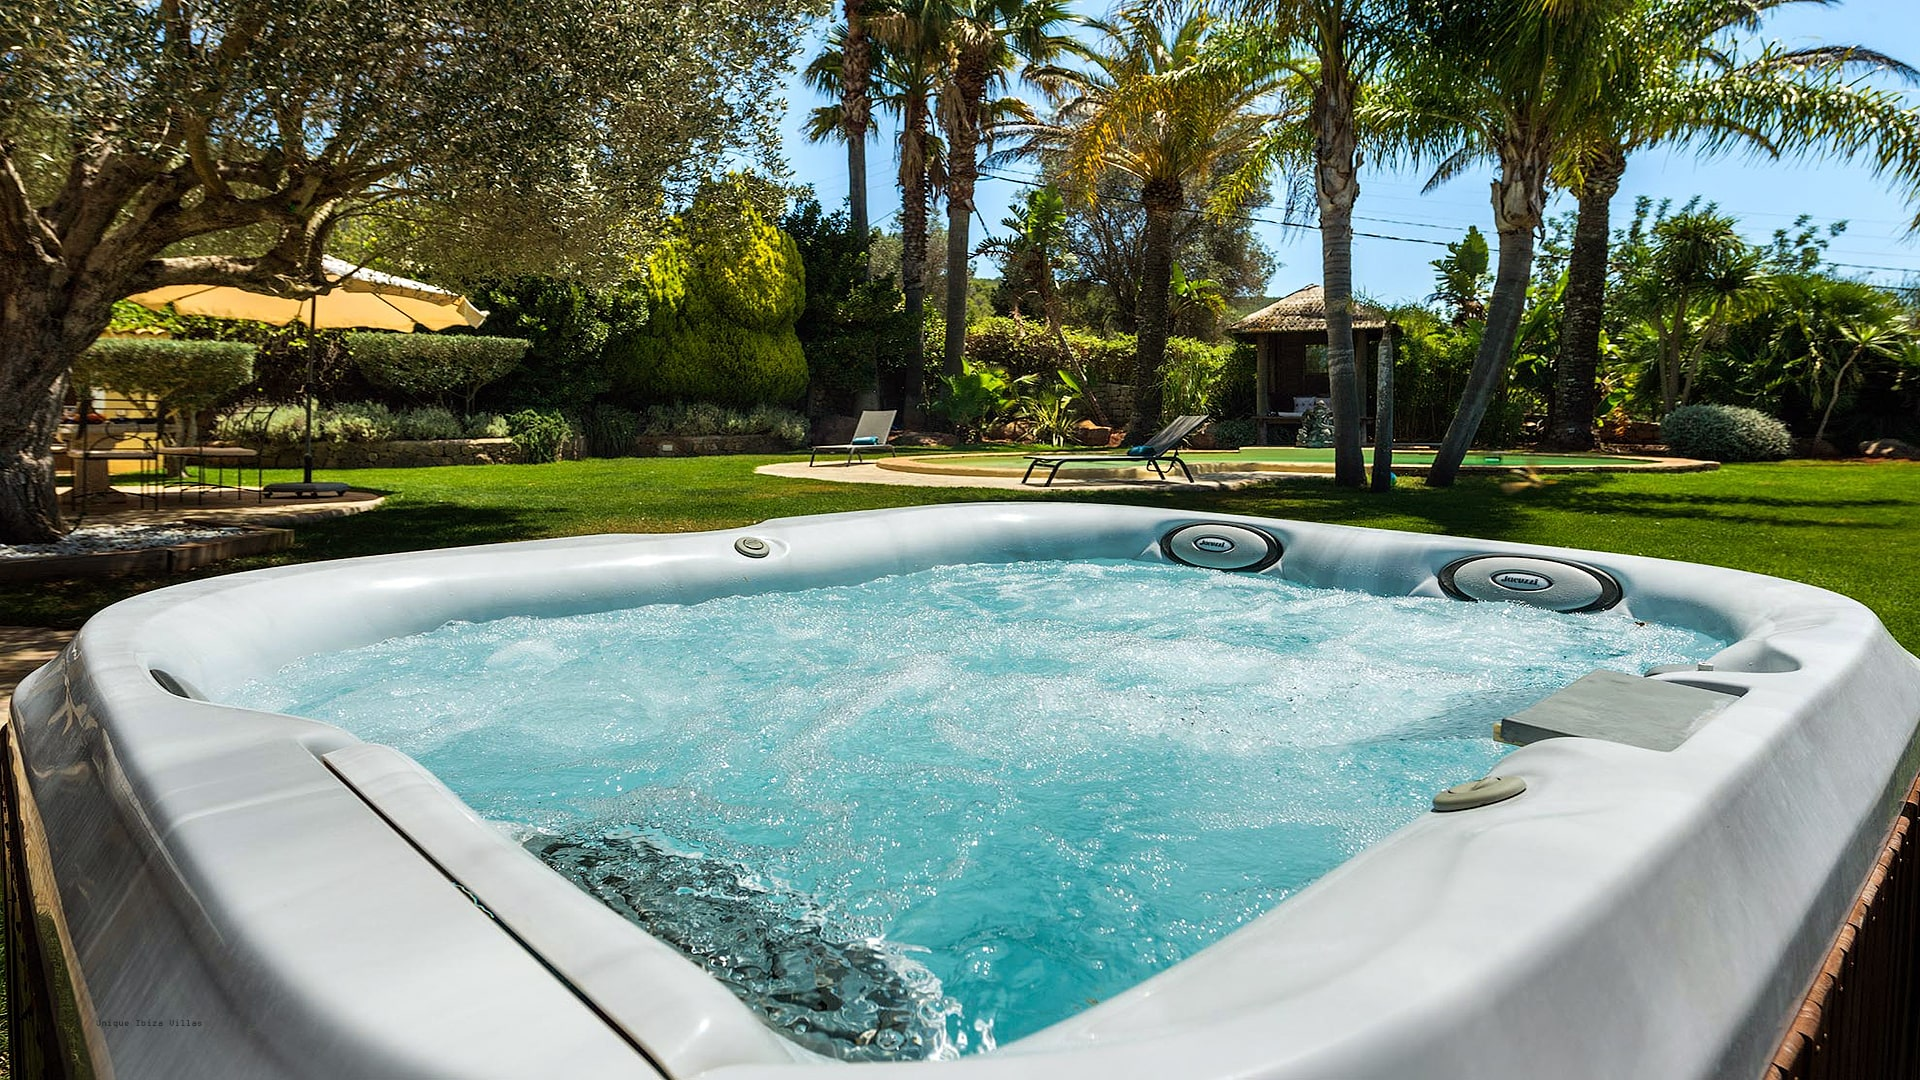 Casa Beni Ibiza 13 Santa Eulalia